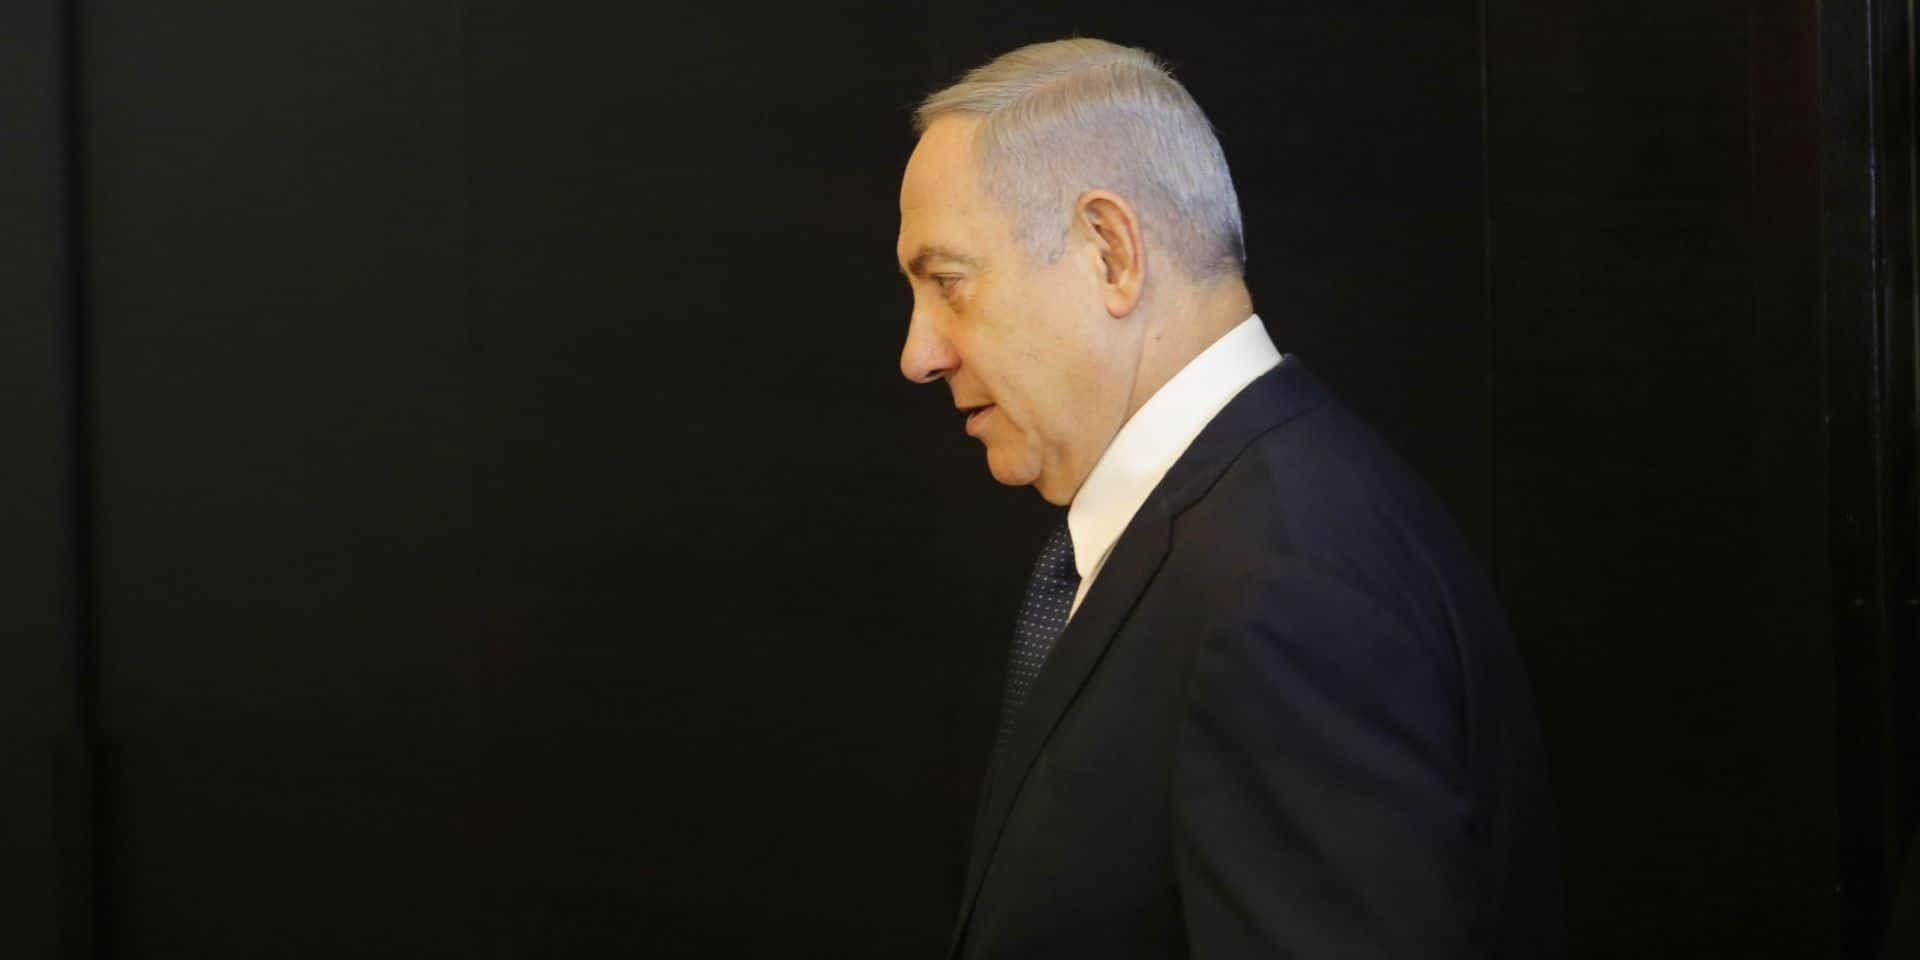 Israël: Benjamin Netanyahu souhaite demander l'immunité au Parlement